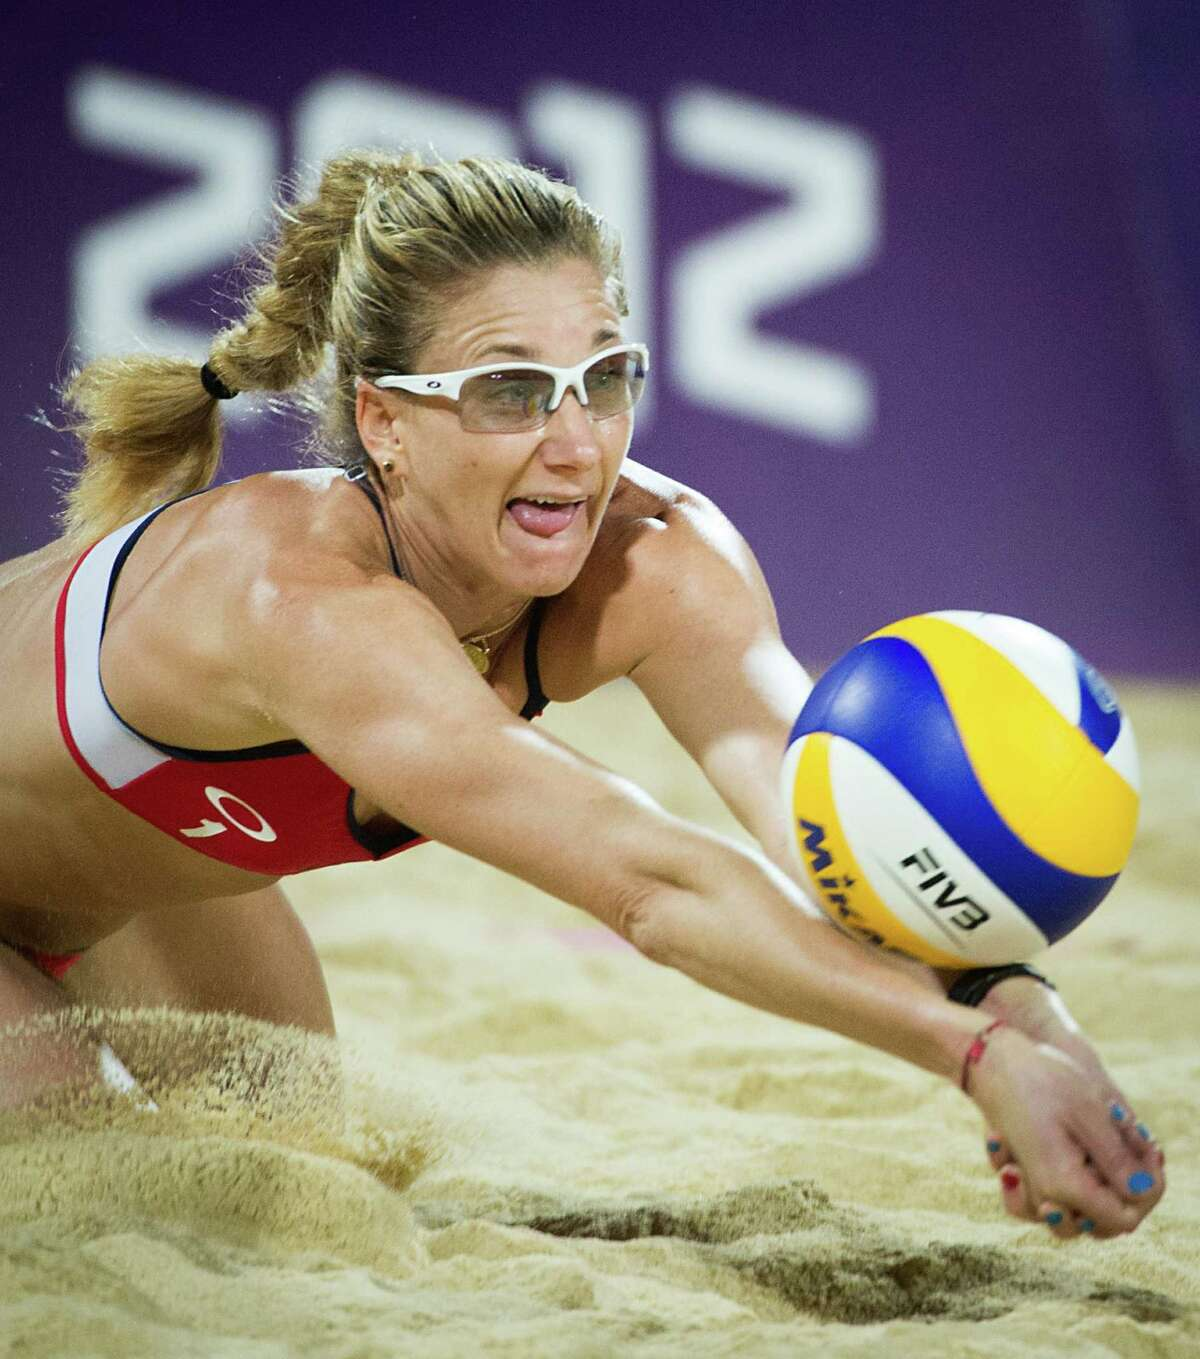 Olympic beach volleyball player Kerri Walsh Jennings